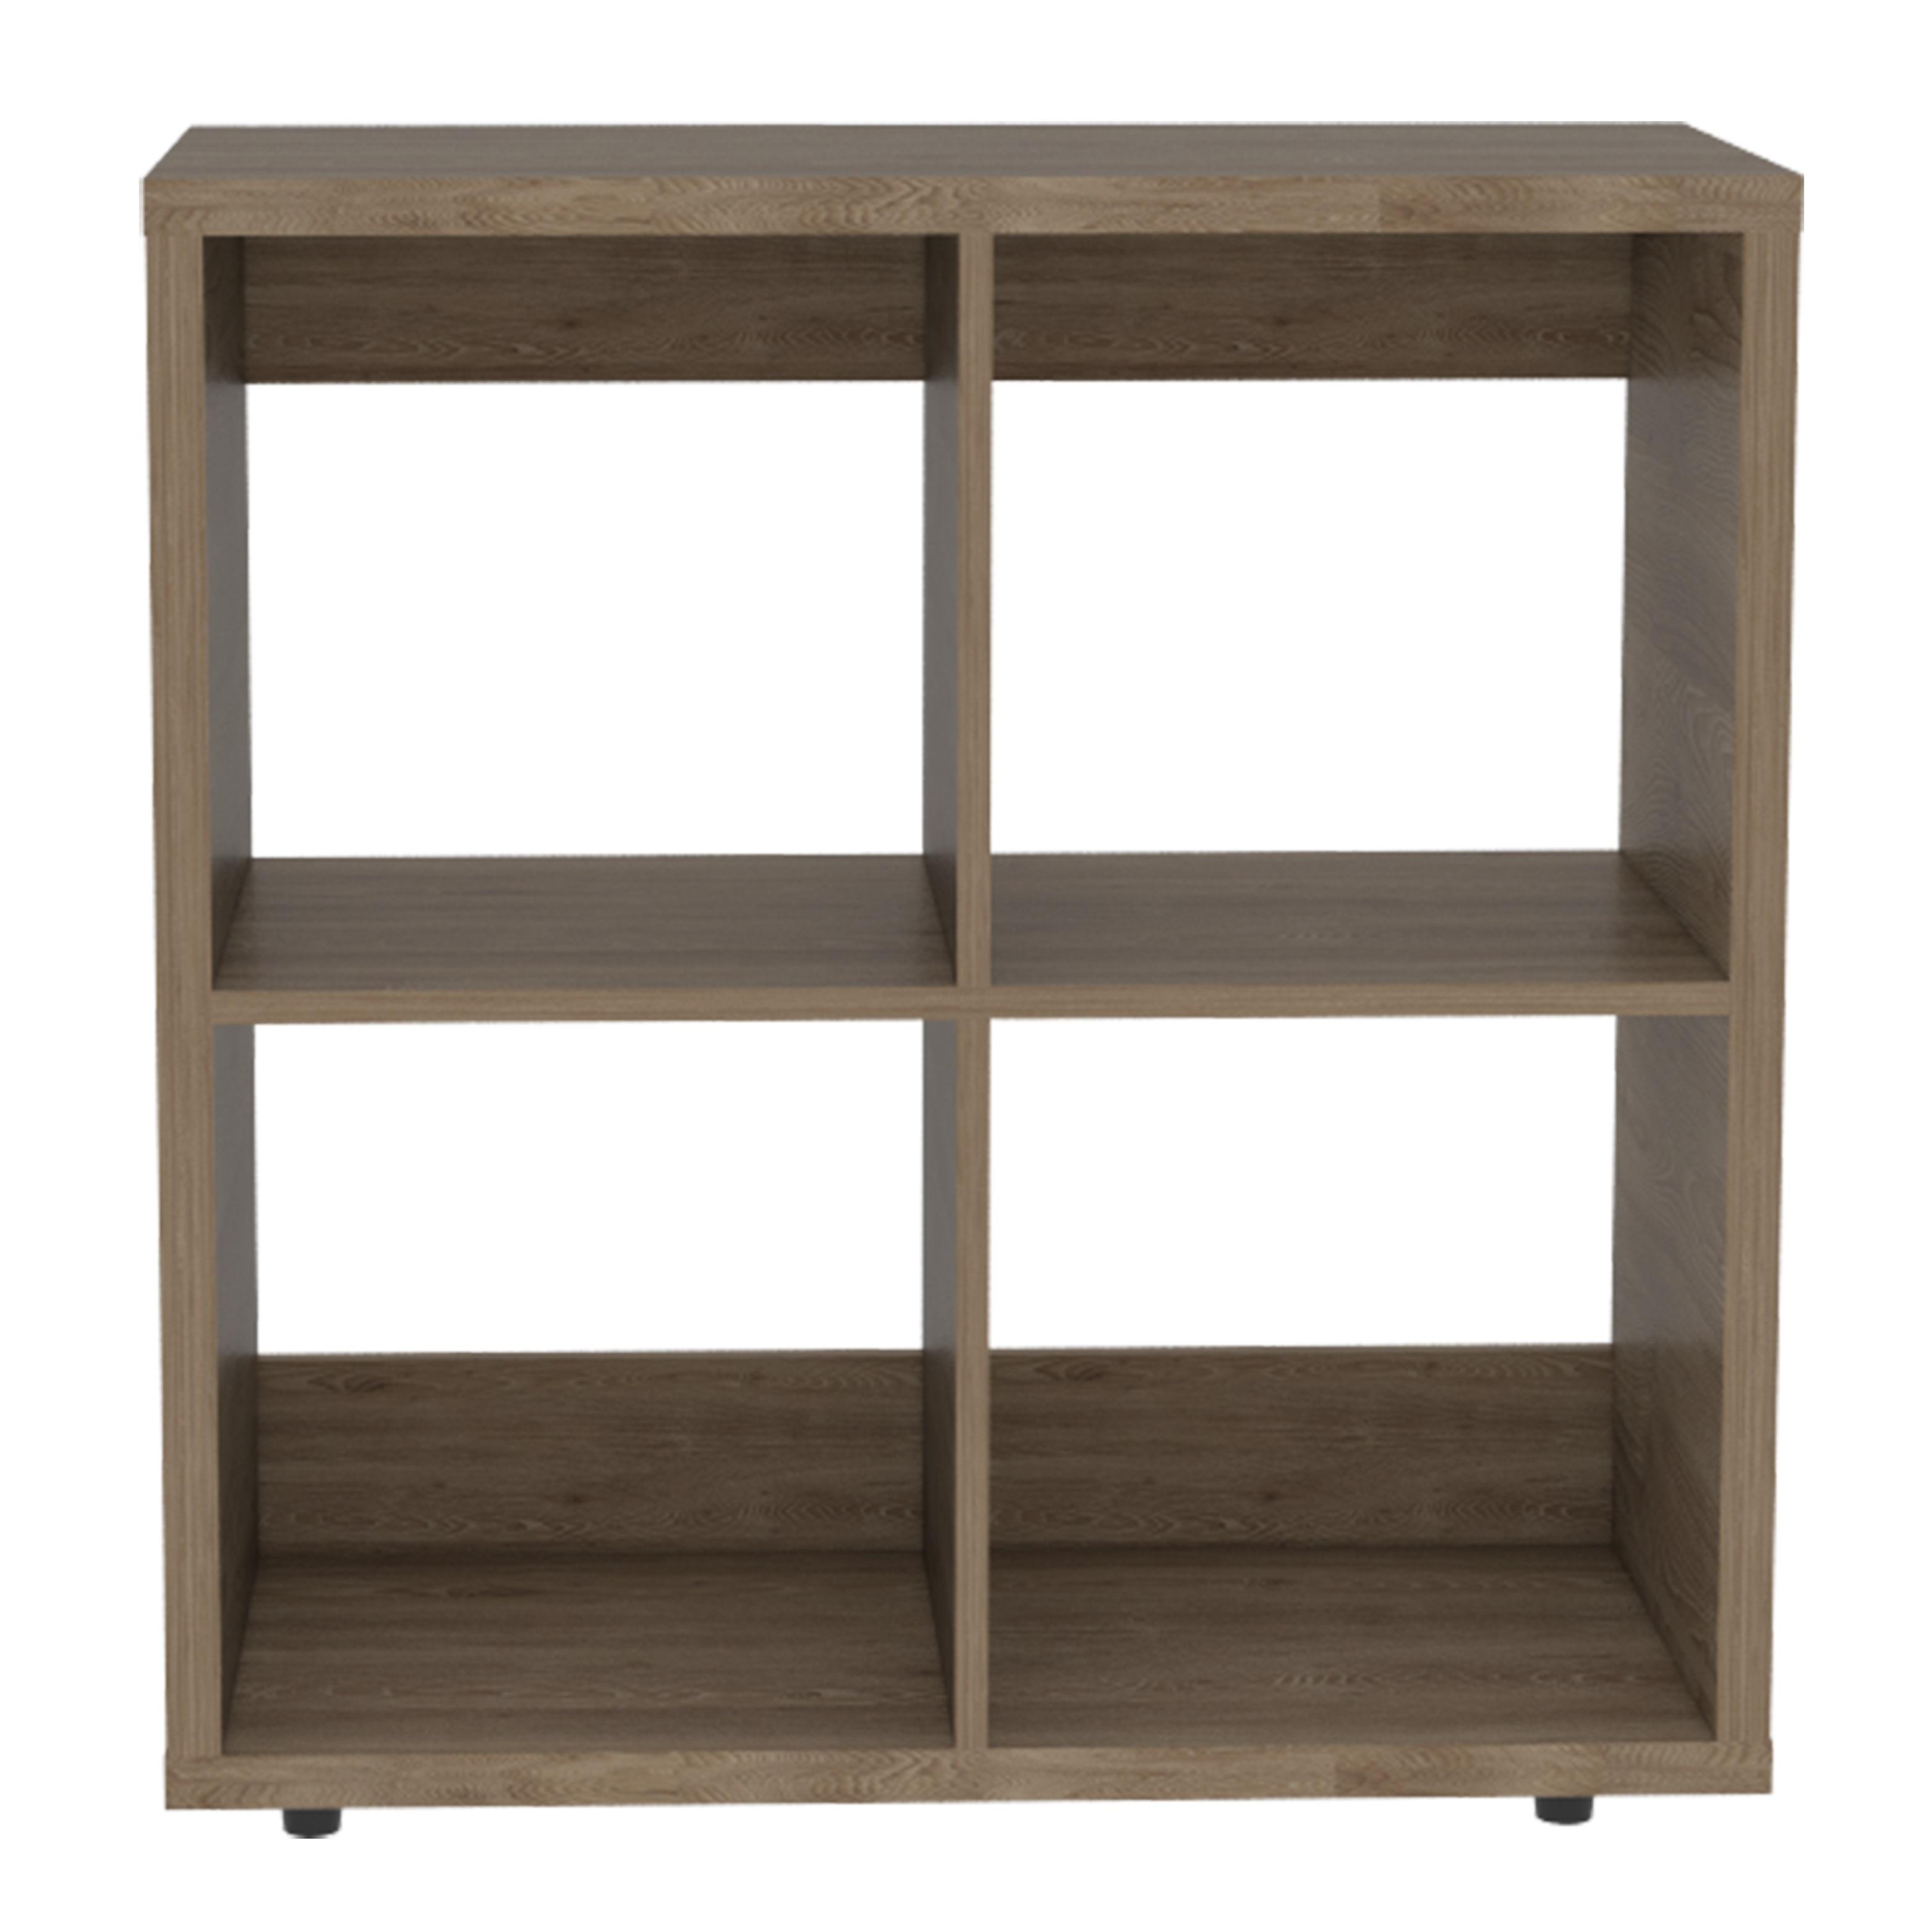 Mueble biblioteca pequeña de 75cm x 73.1cm x 34cm modelo Tanger de color miel RT